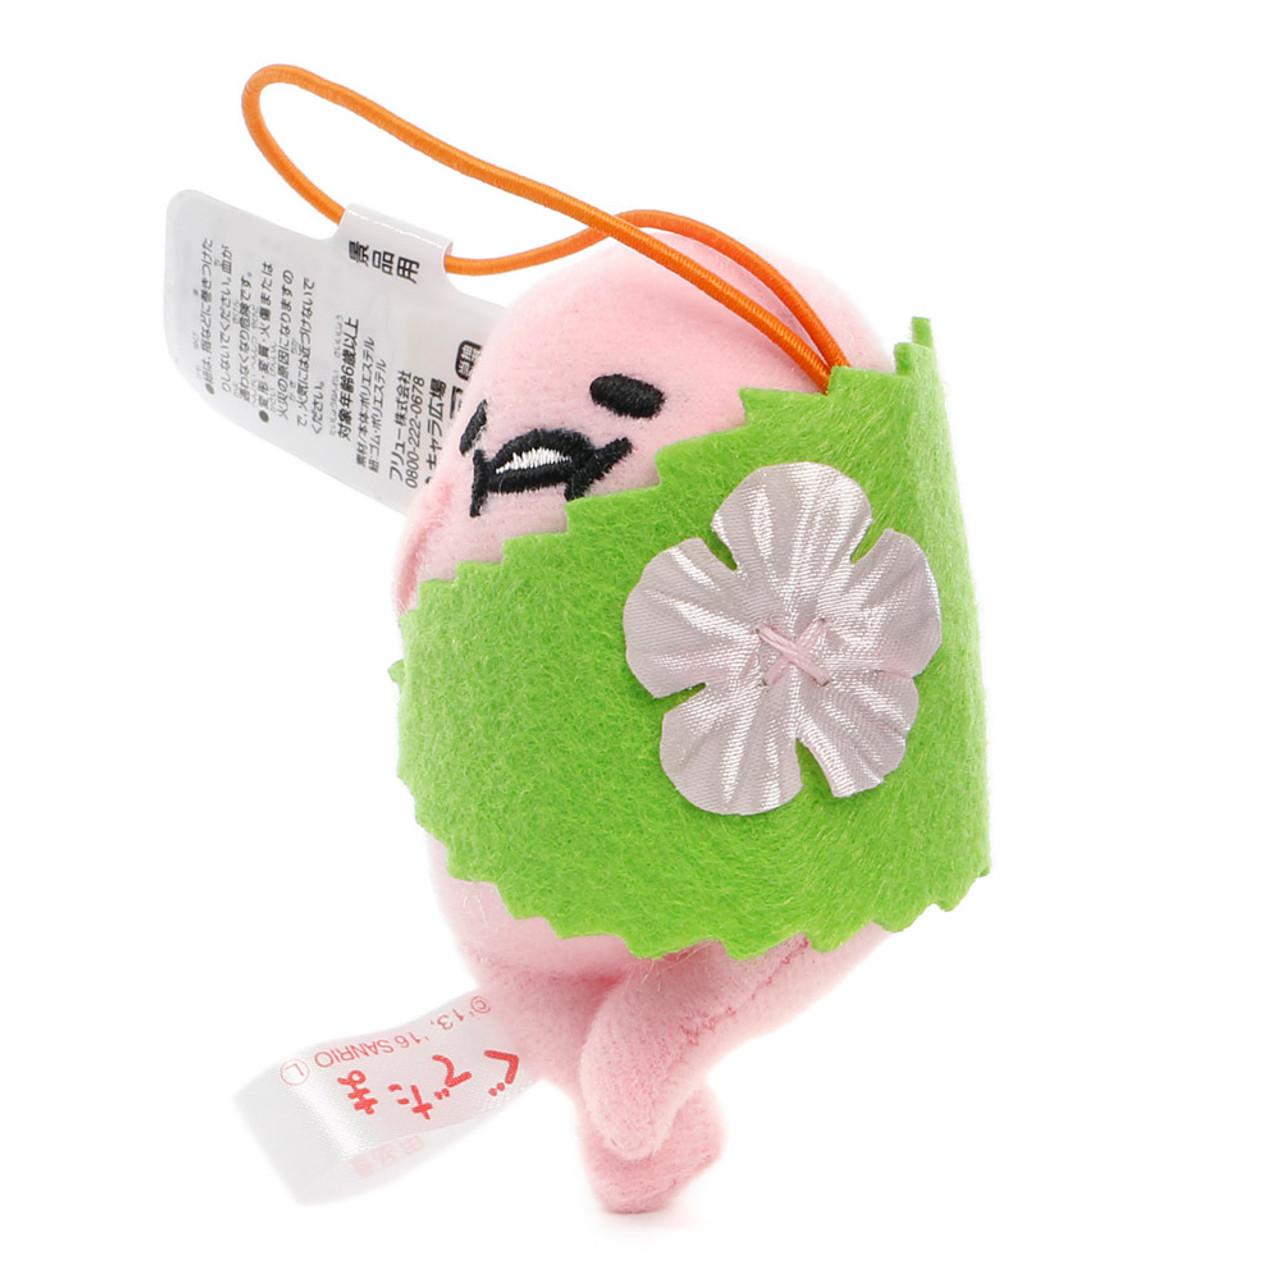 Sanrio Gudetama Lazy Egg Sakura Mascot Plush Charms - Cherry Blossom Rice Cake ( Side View )